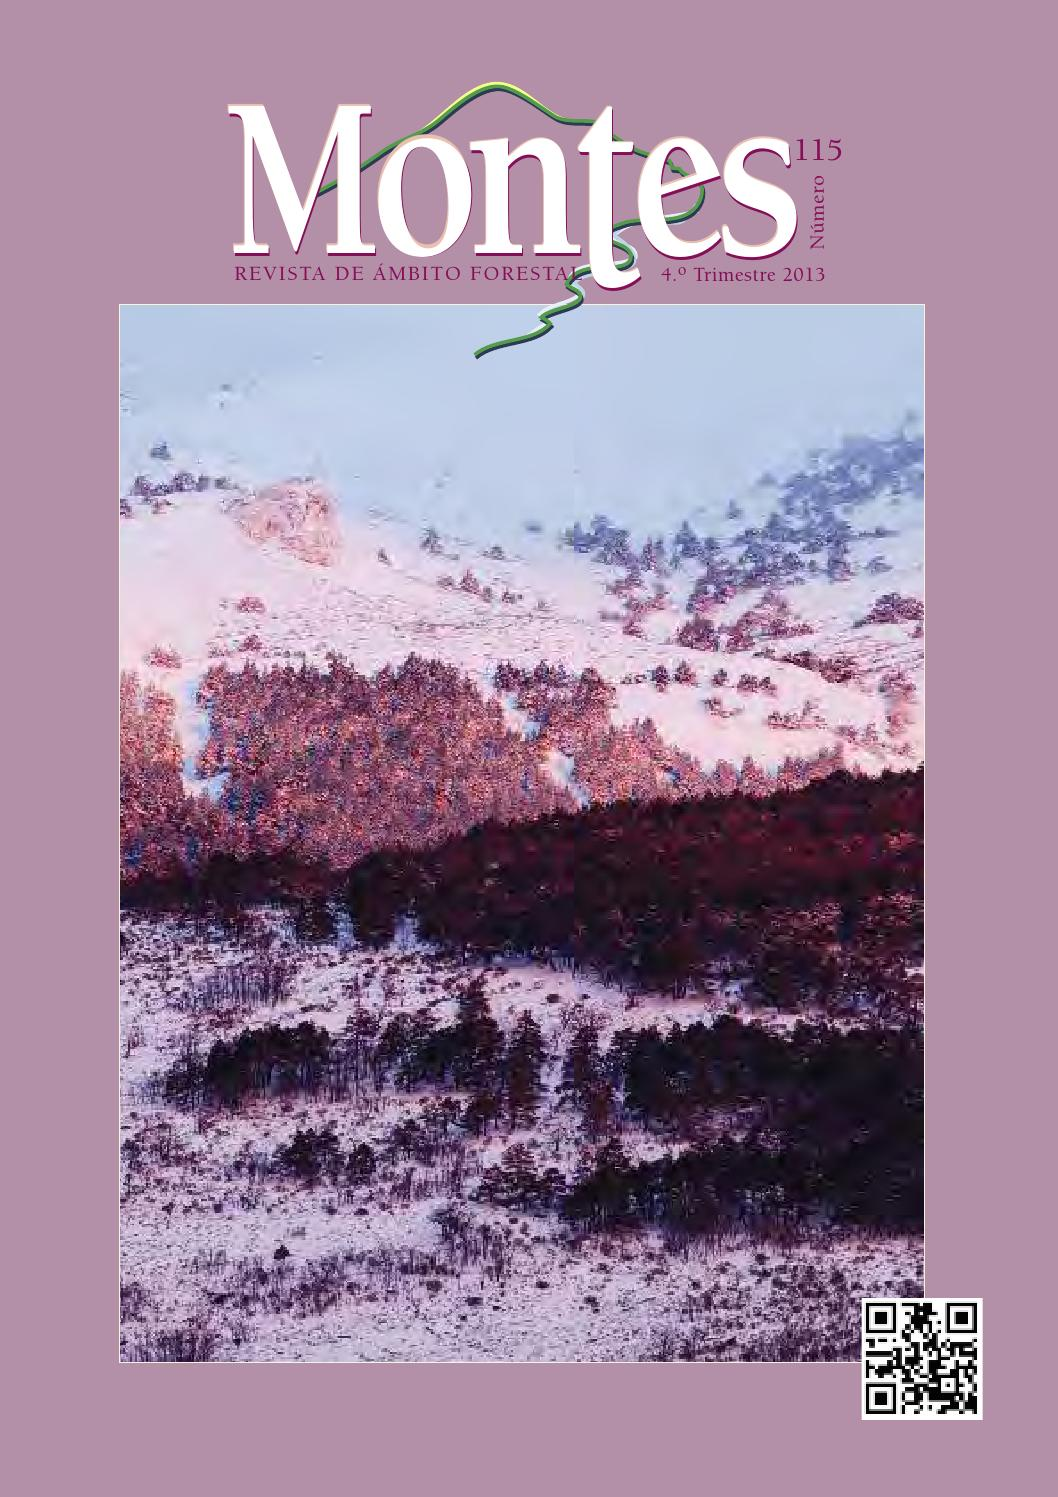 Montes, Revista de ámbito forestal. Número 115, IV trimestre 2013 by ...